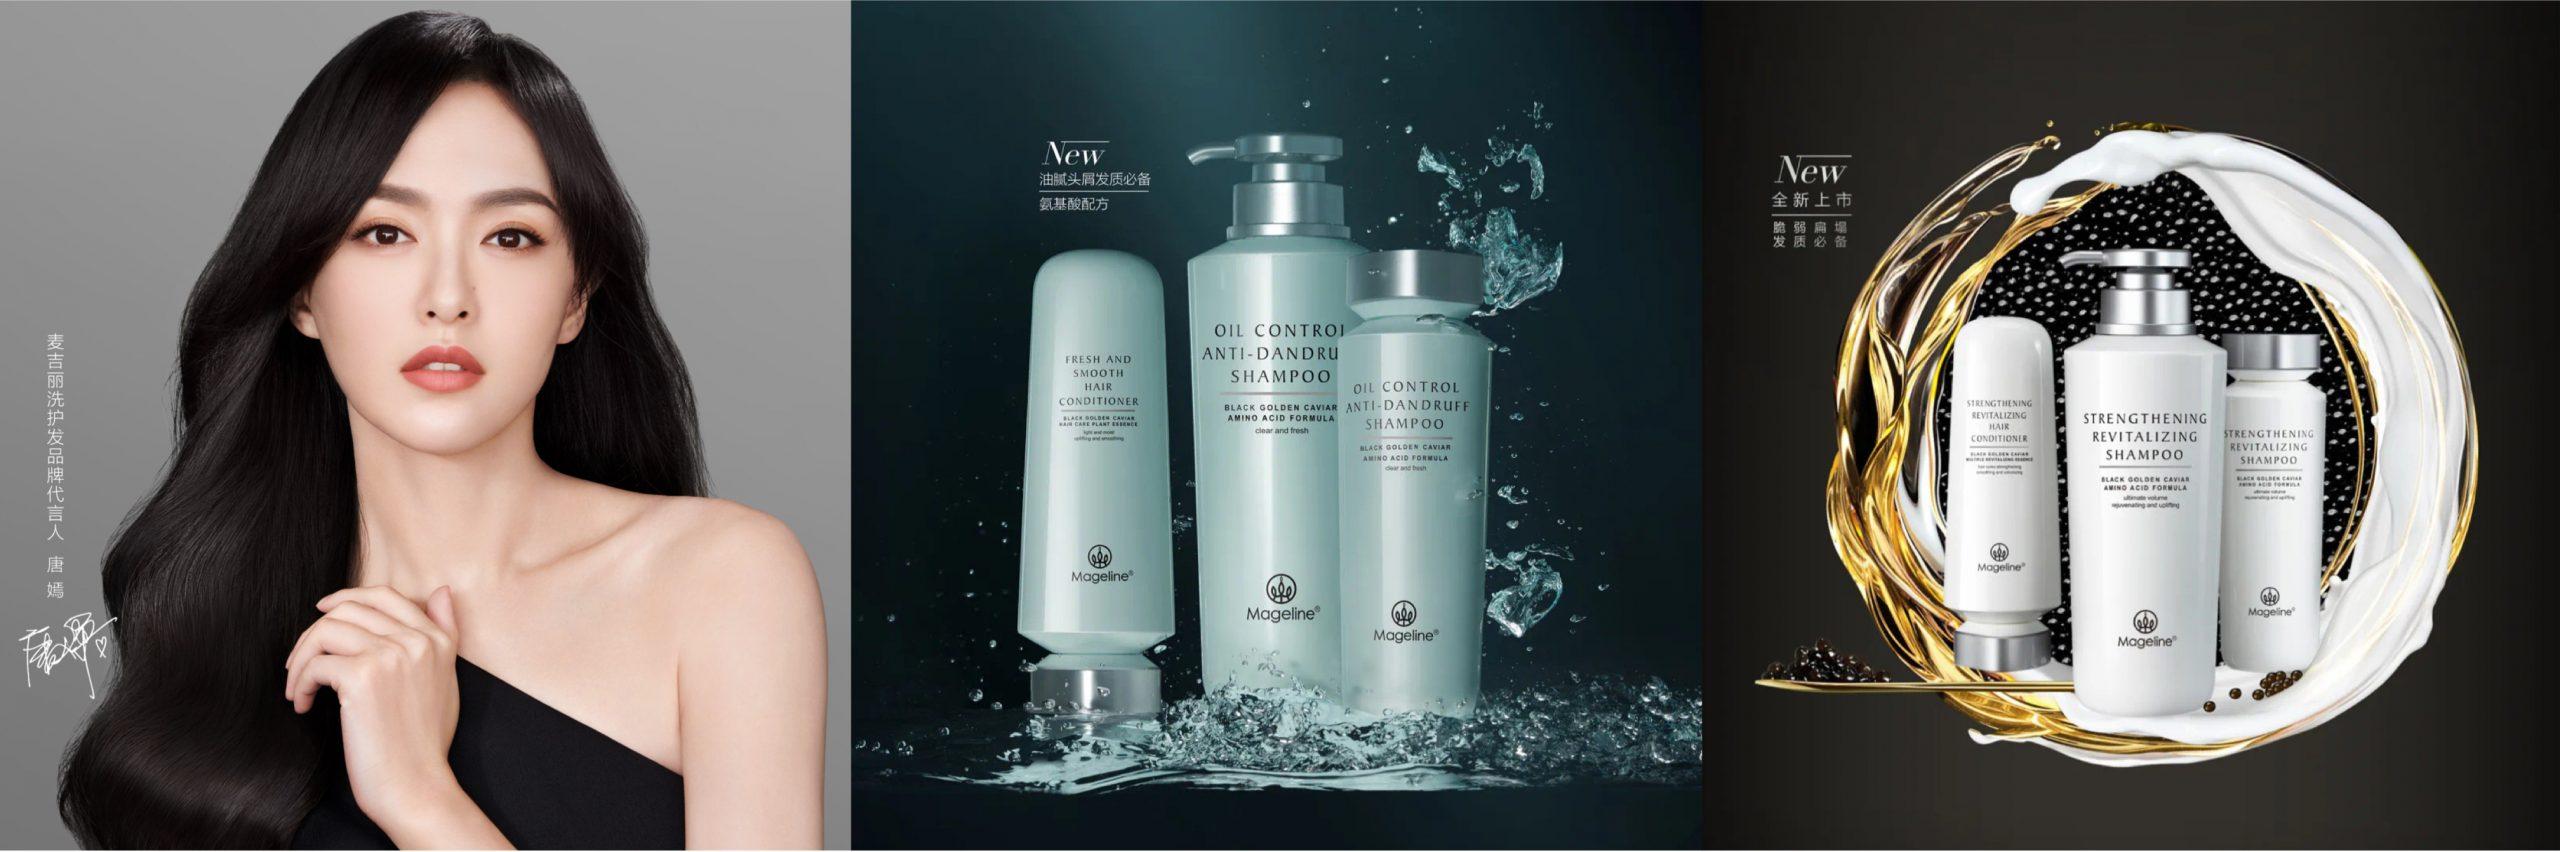 mageline scalp care shampoo